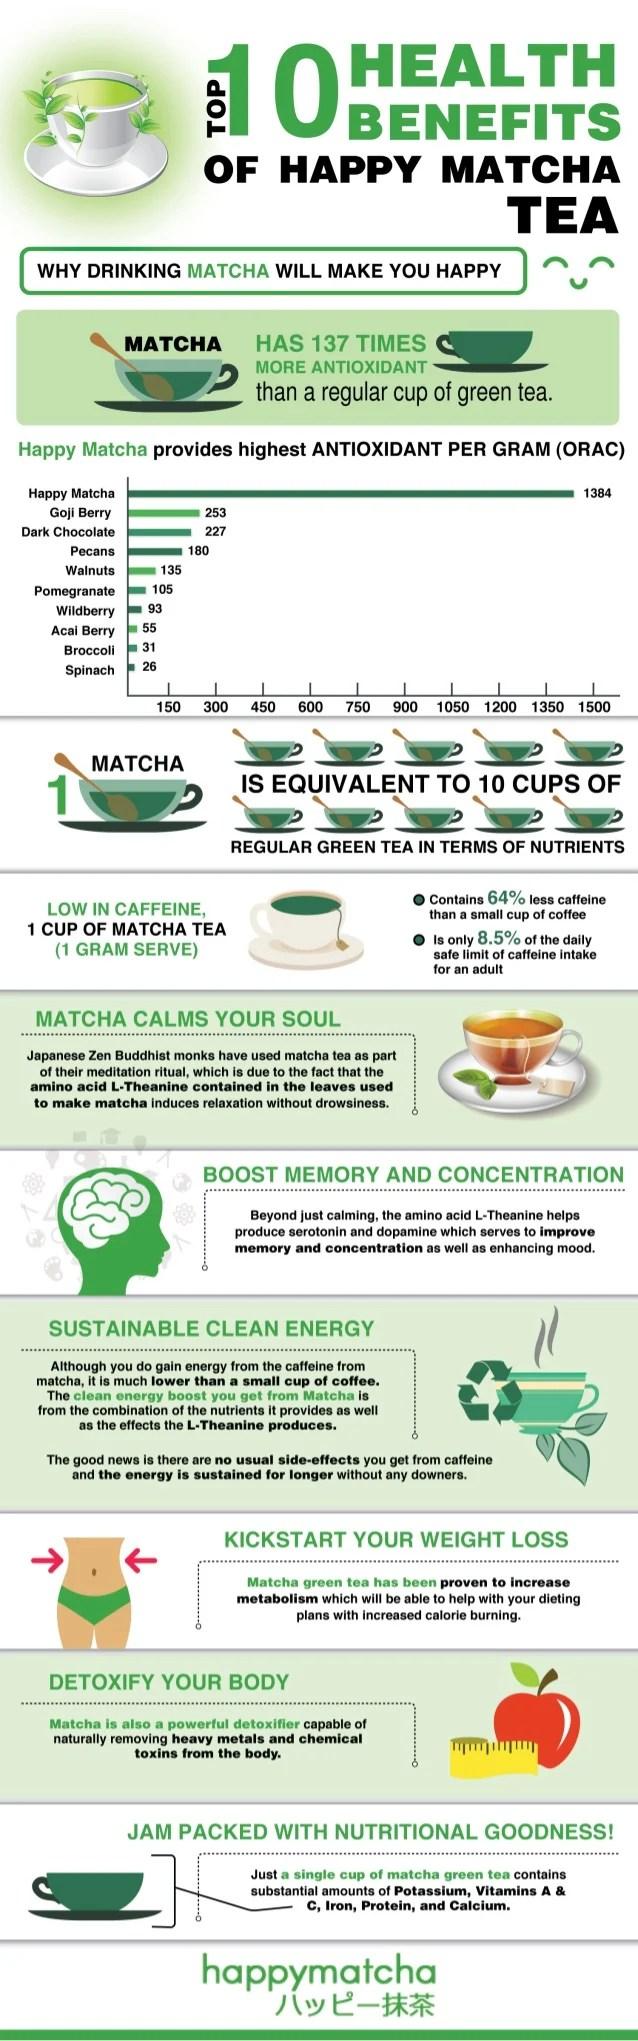 Top 10 Health Benefits Of Drinking Matcha Green Tea